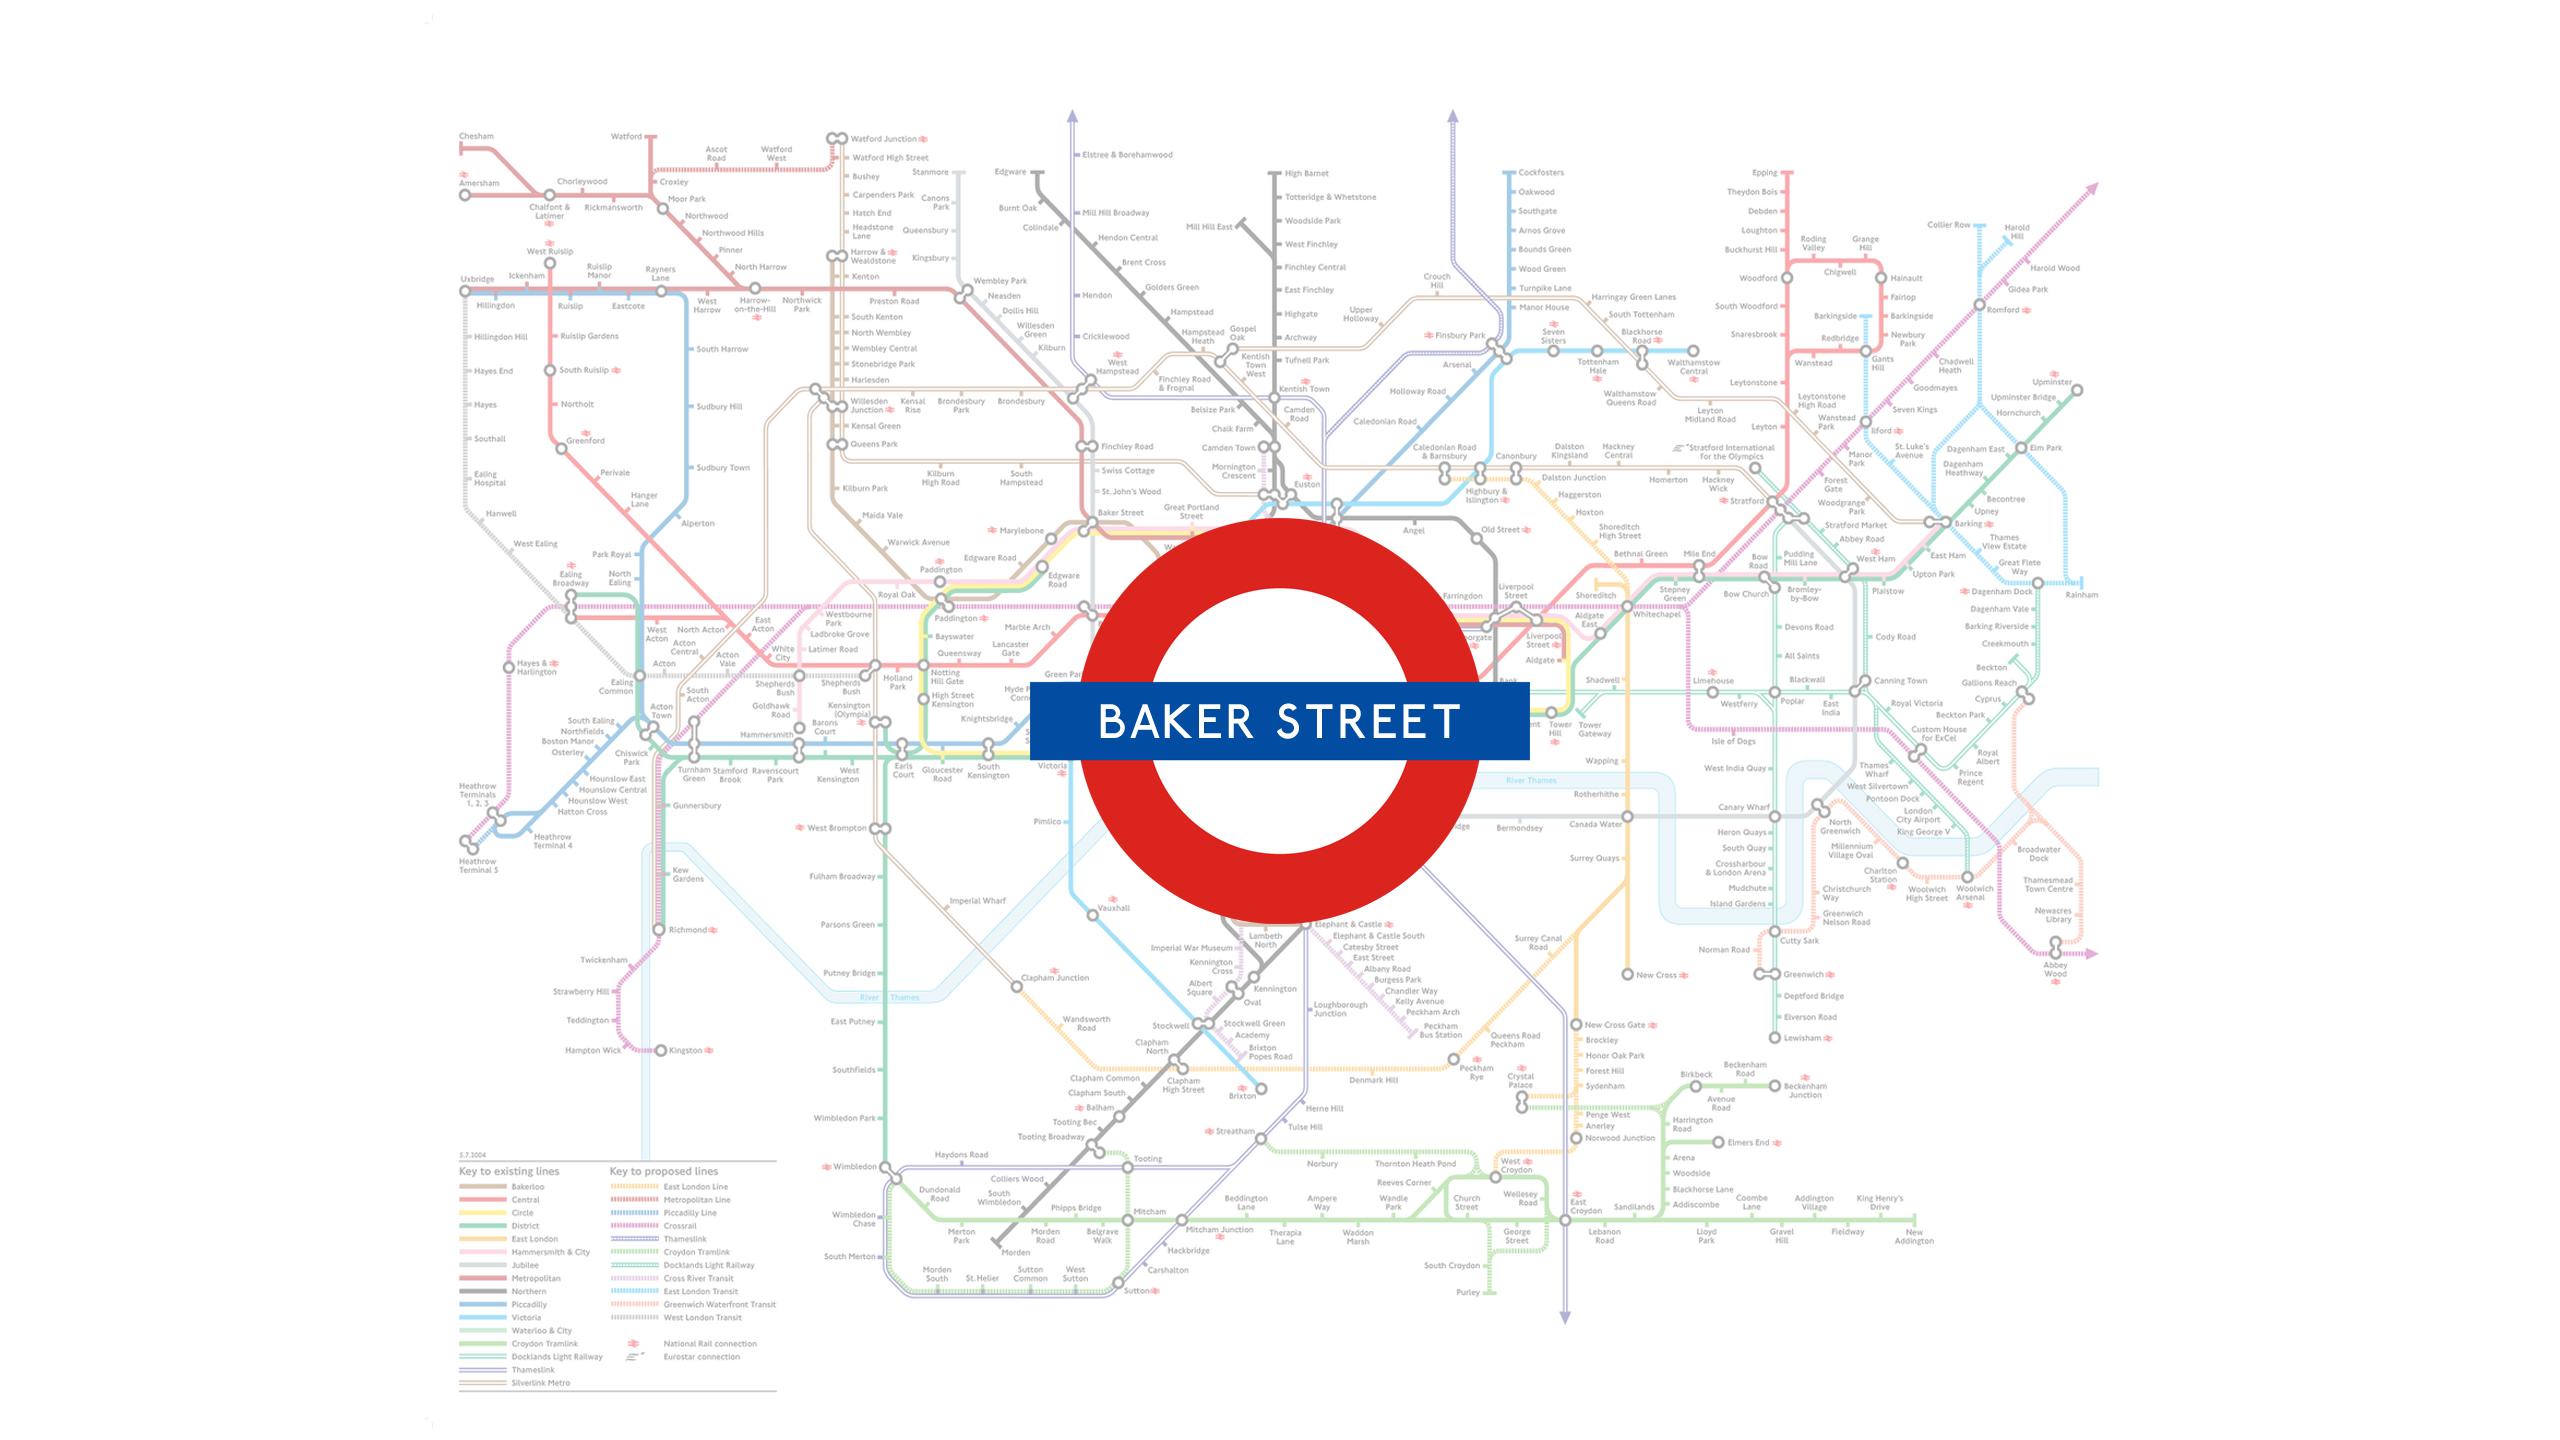 Baker Street (Map)